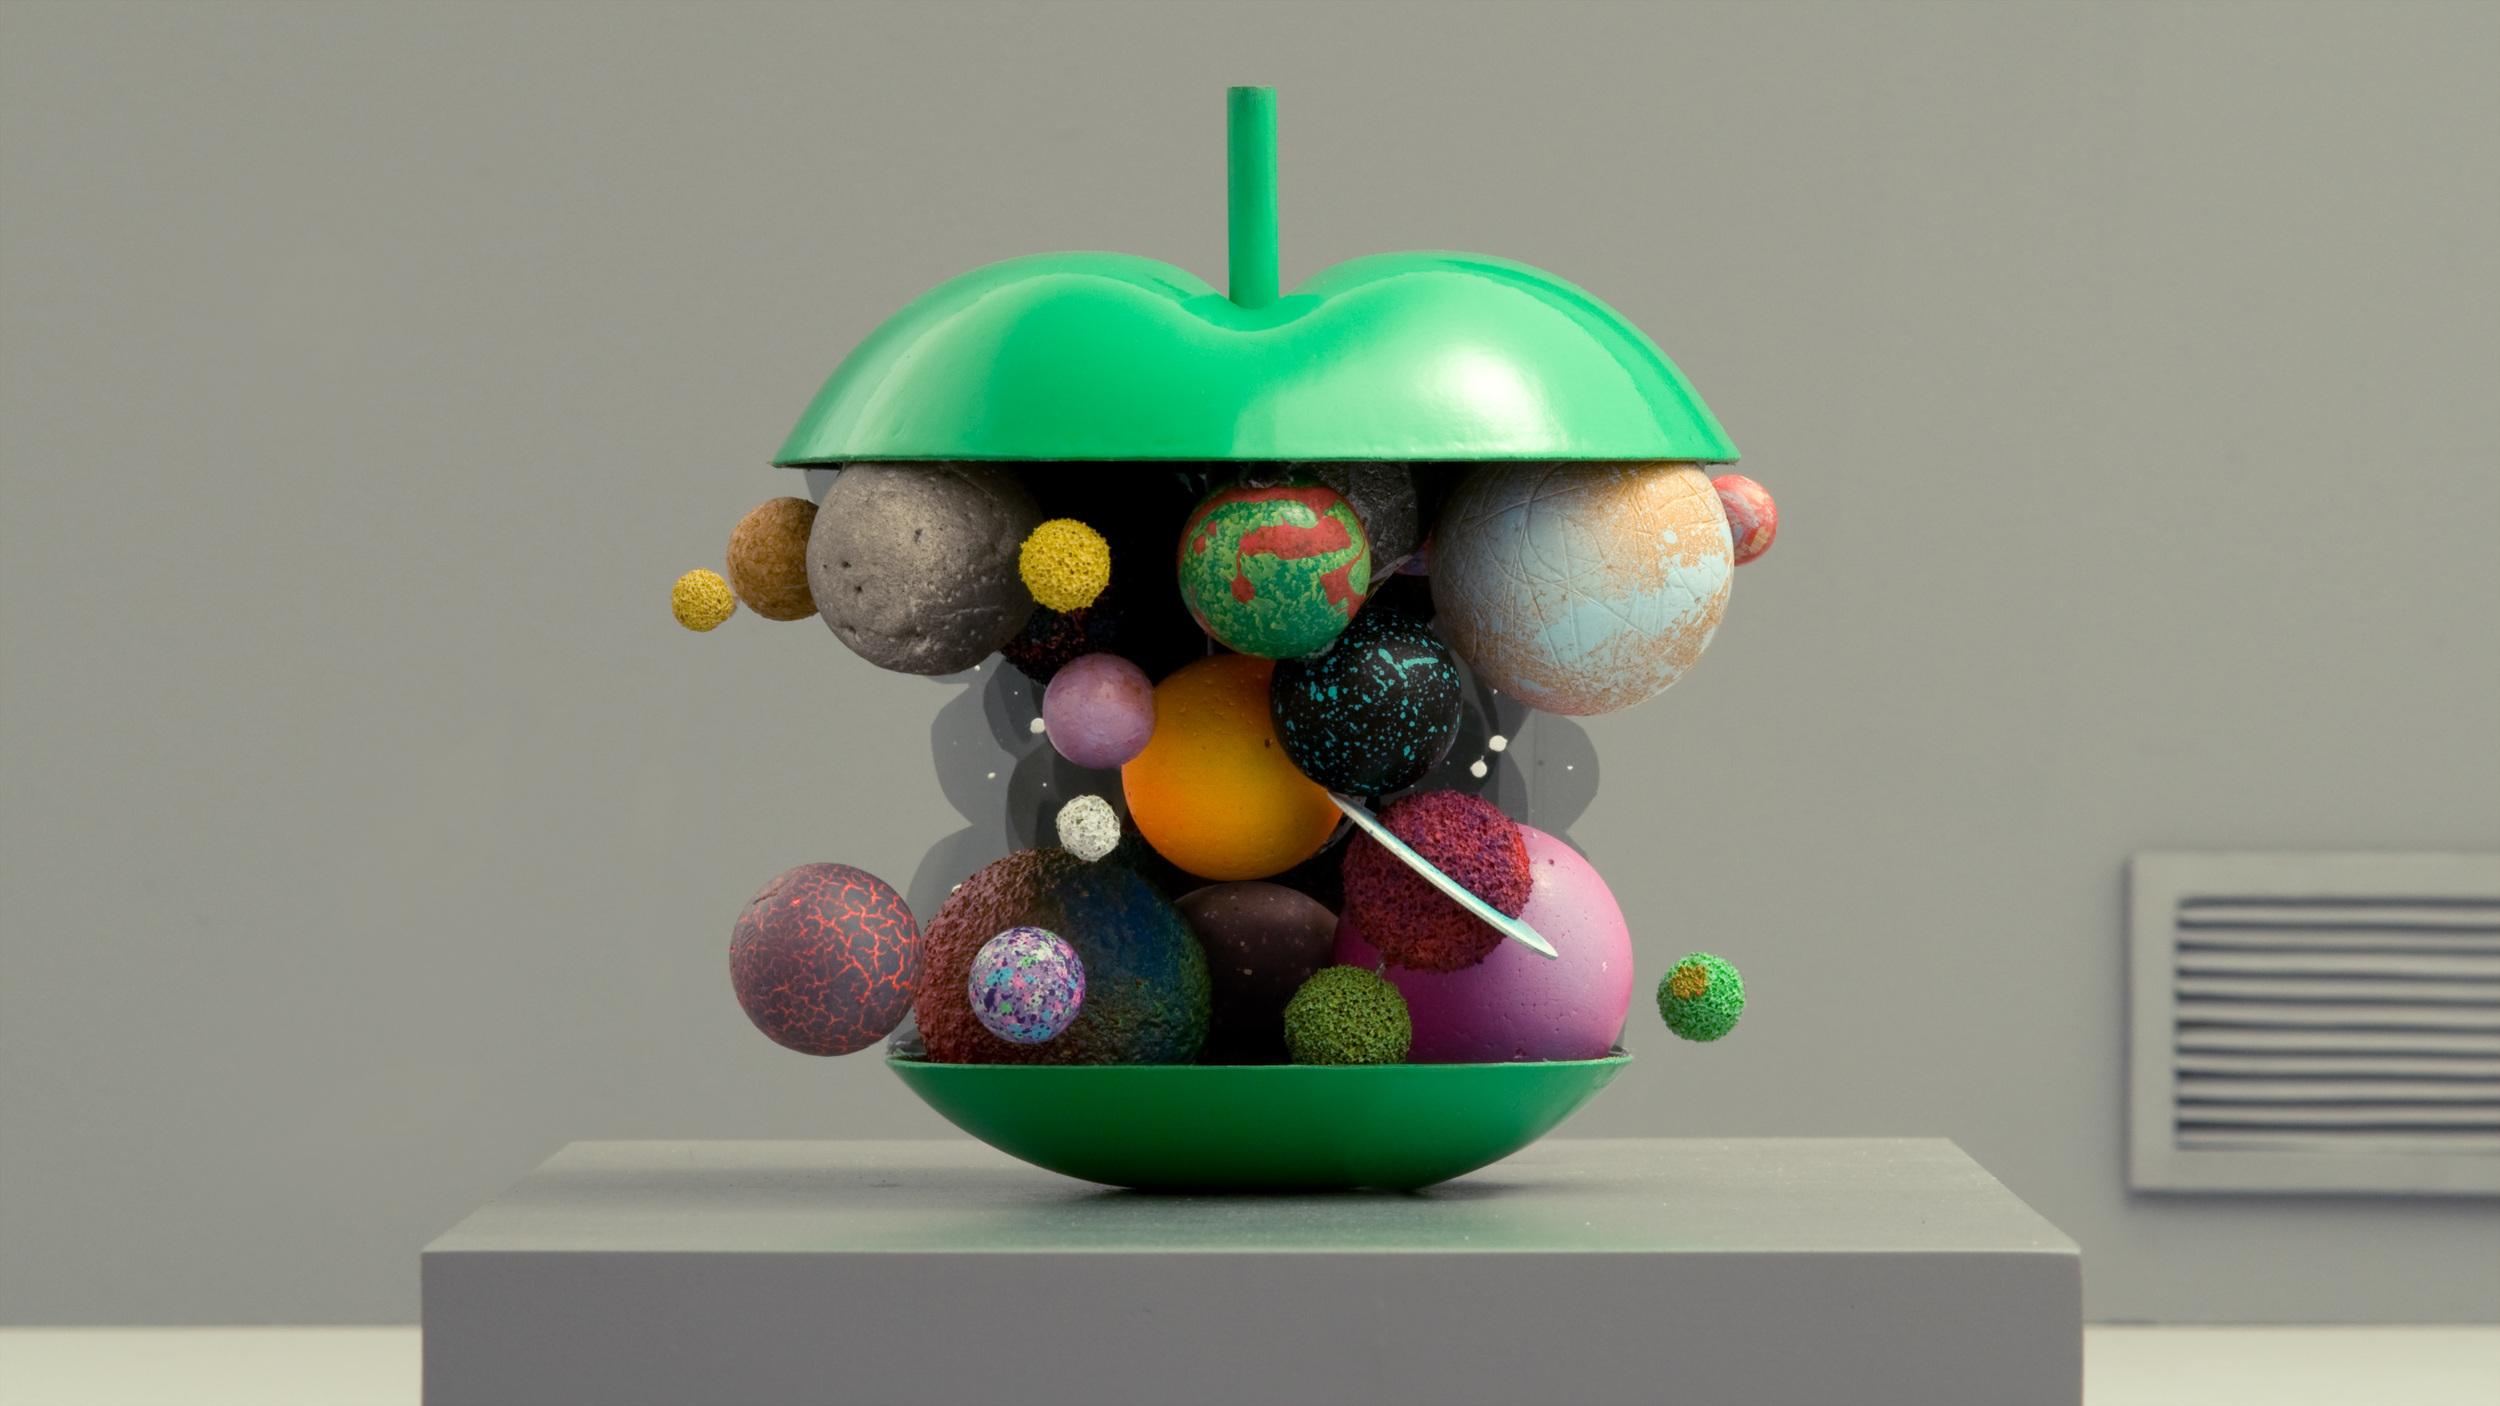 KH_planets_apple.jpg